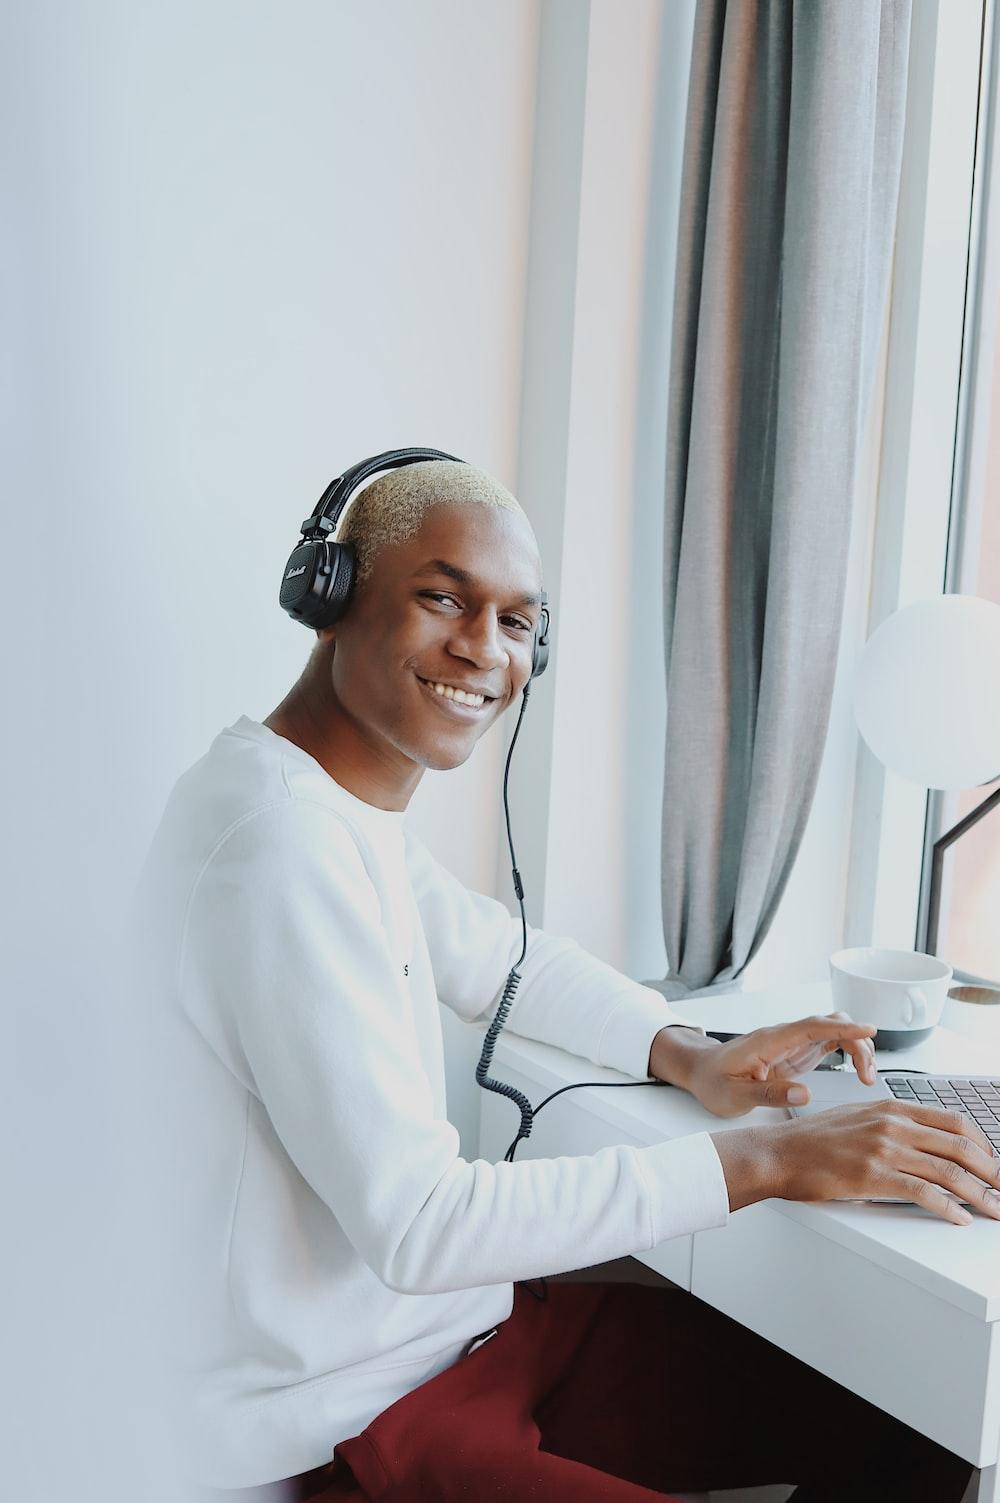 woman in white long sleeve shirt wearing headphones